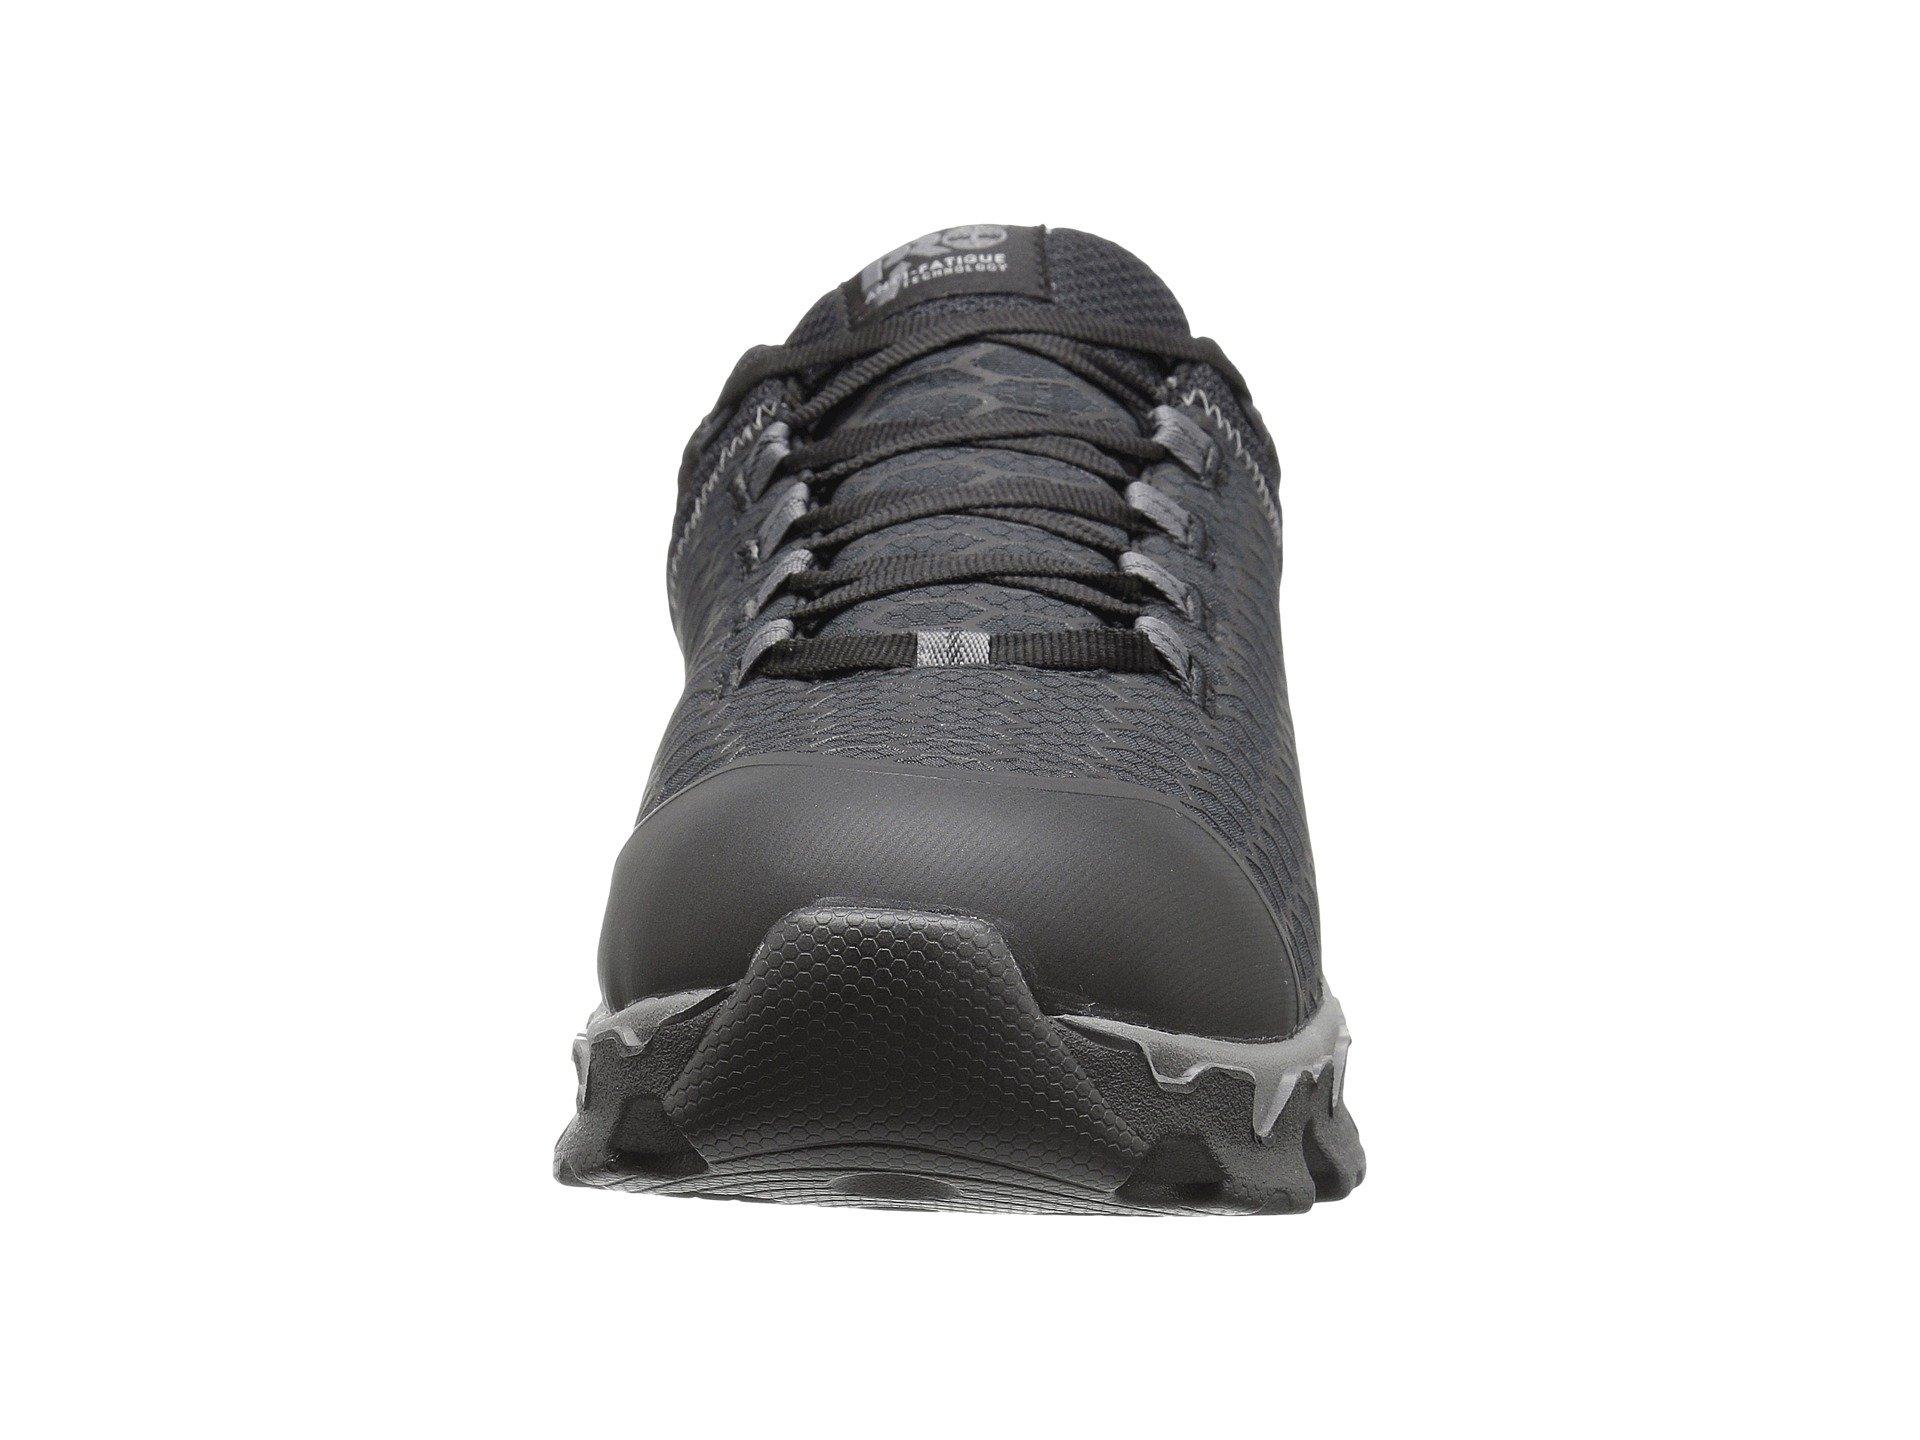 Powertrain Synthetic Toe Black Timberland Soft Pro Sd qg1wT58